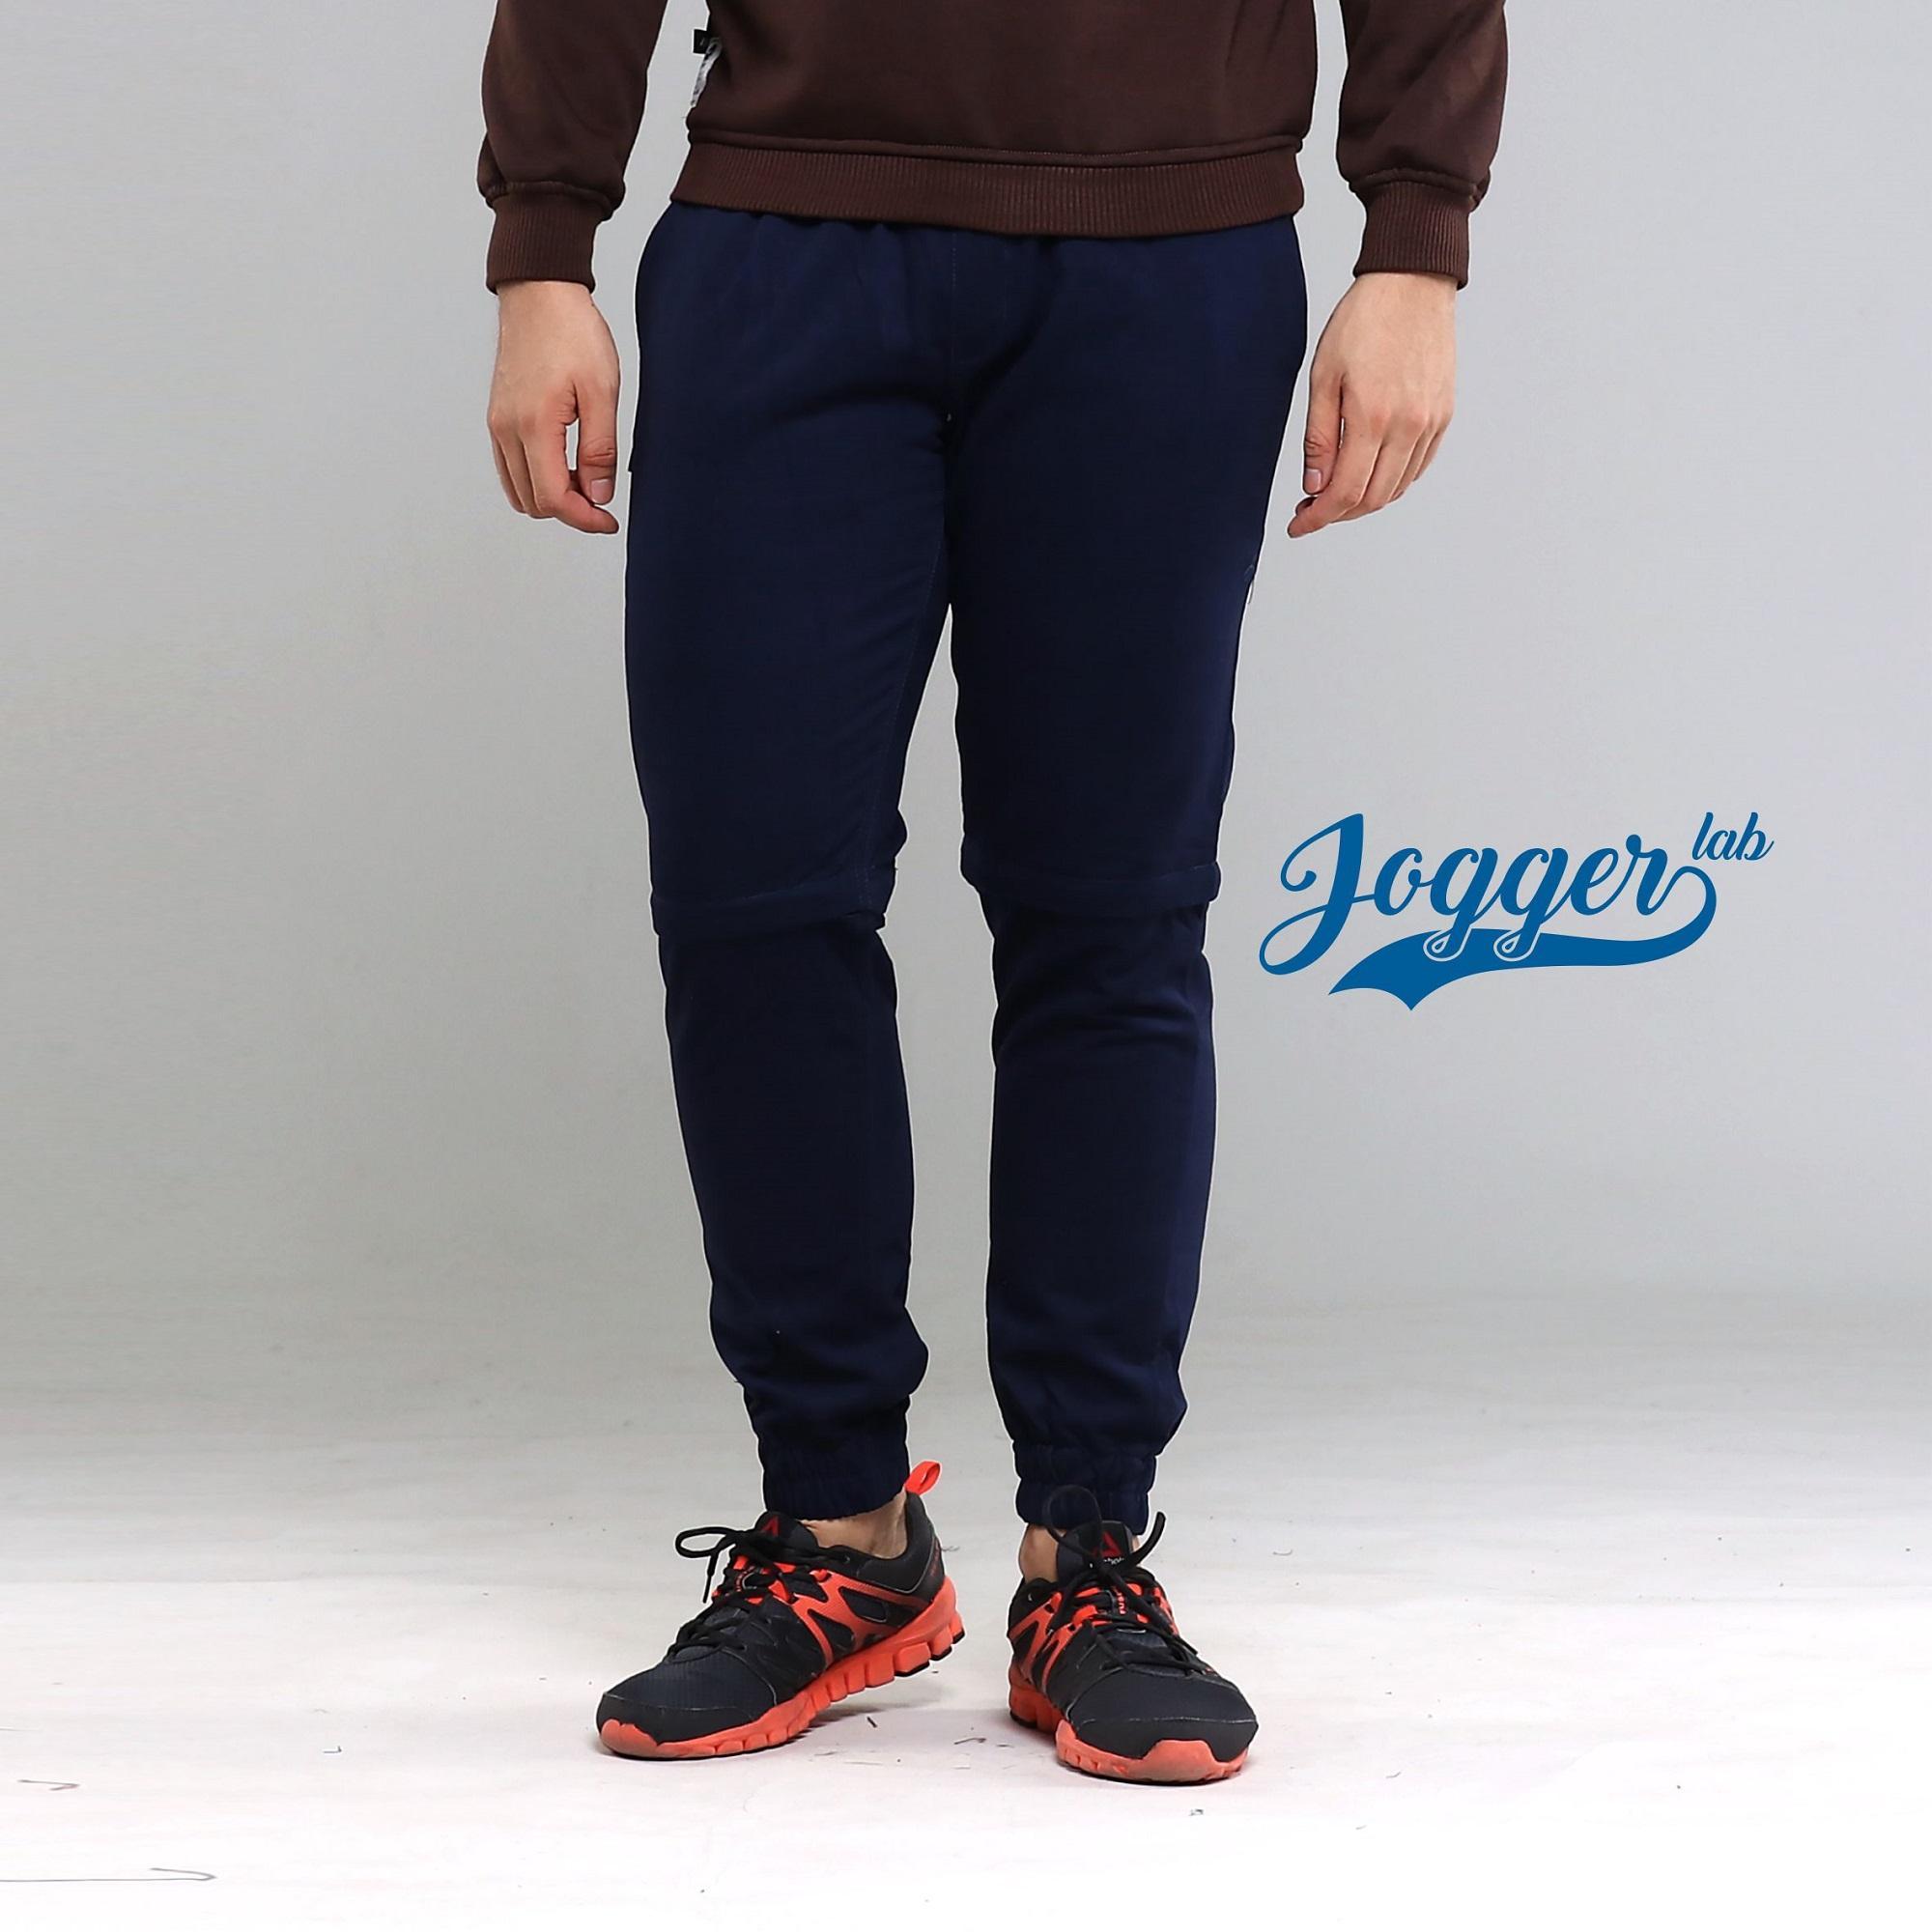 Jfashion Celana jogger training Panjang Pria Basic Brooklyn Source Jogger Lab Jogger 2 .